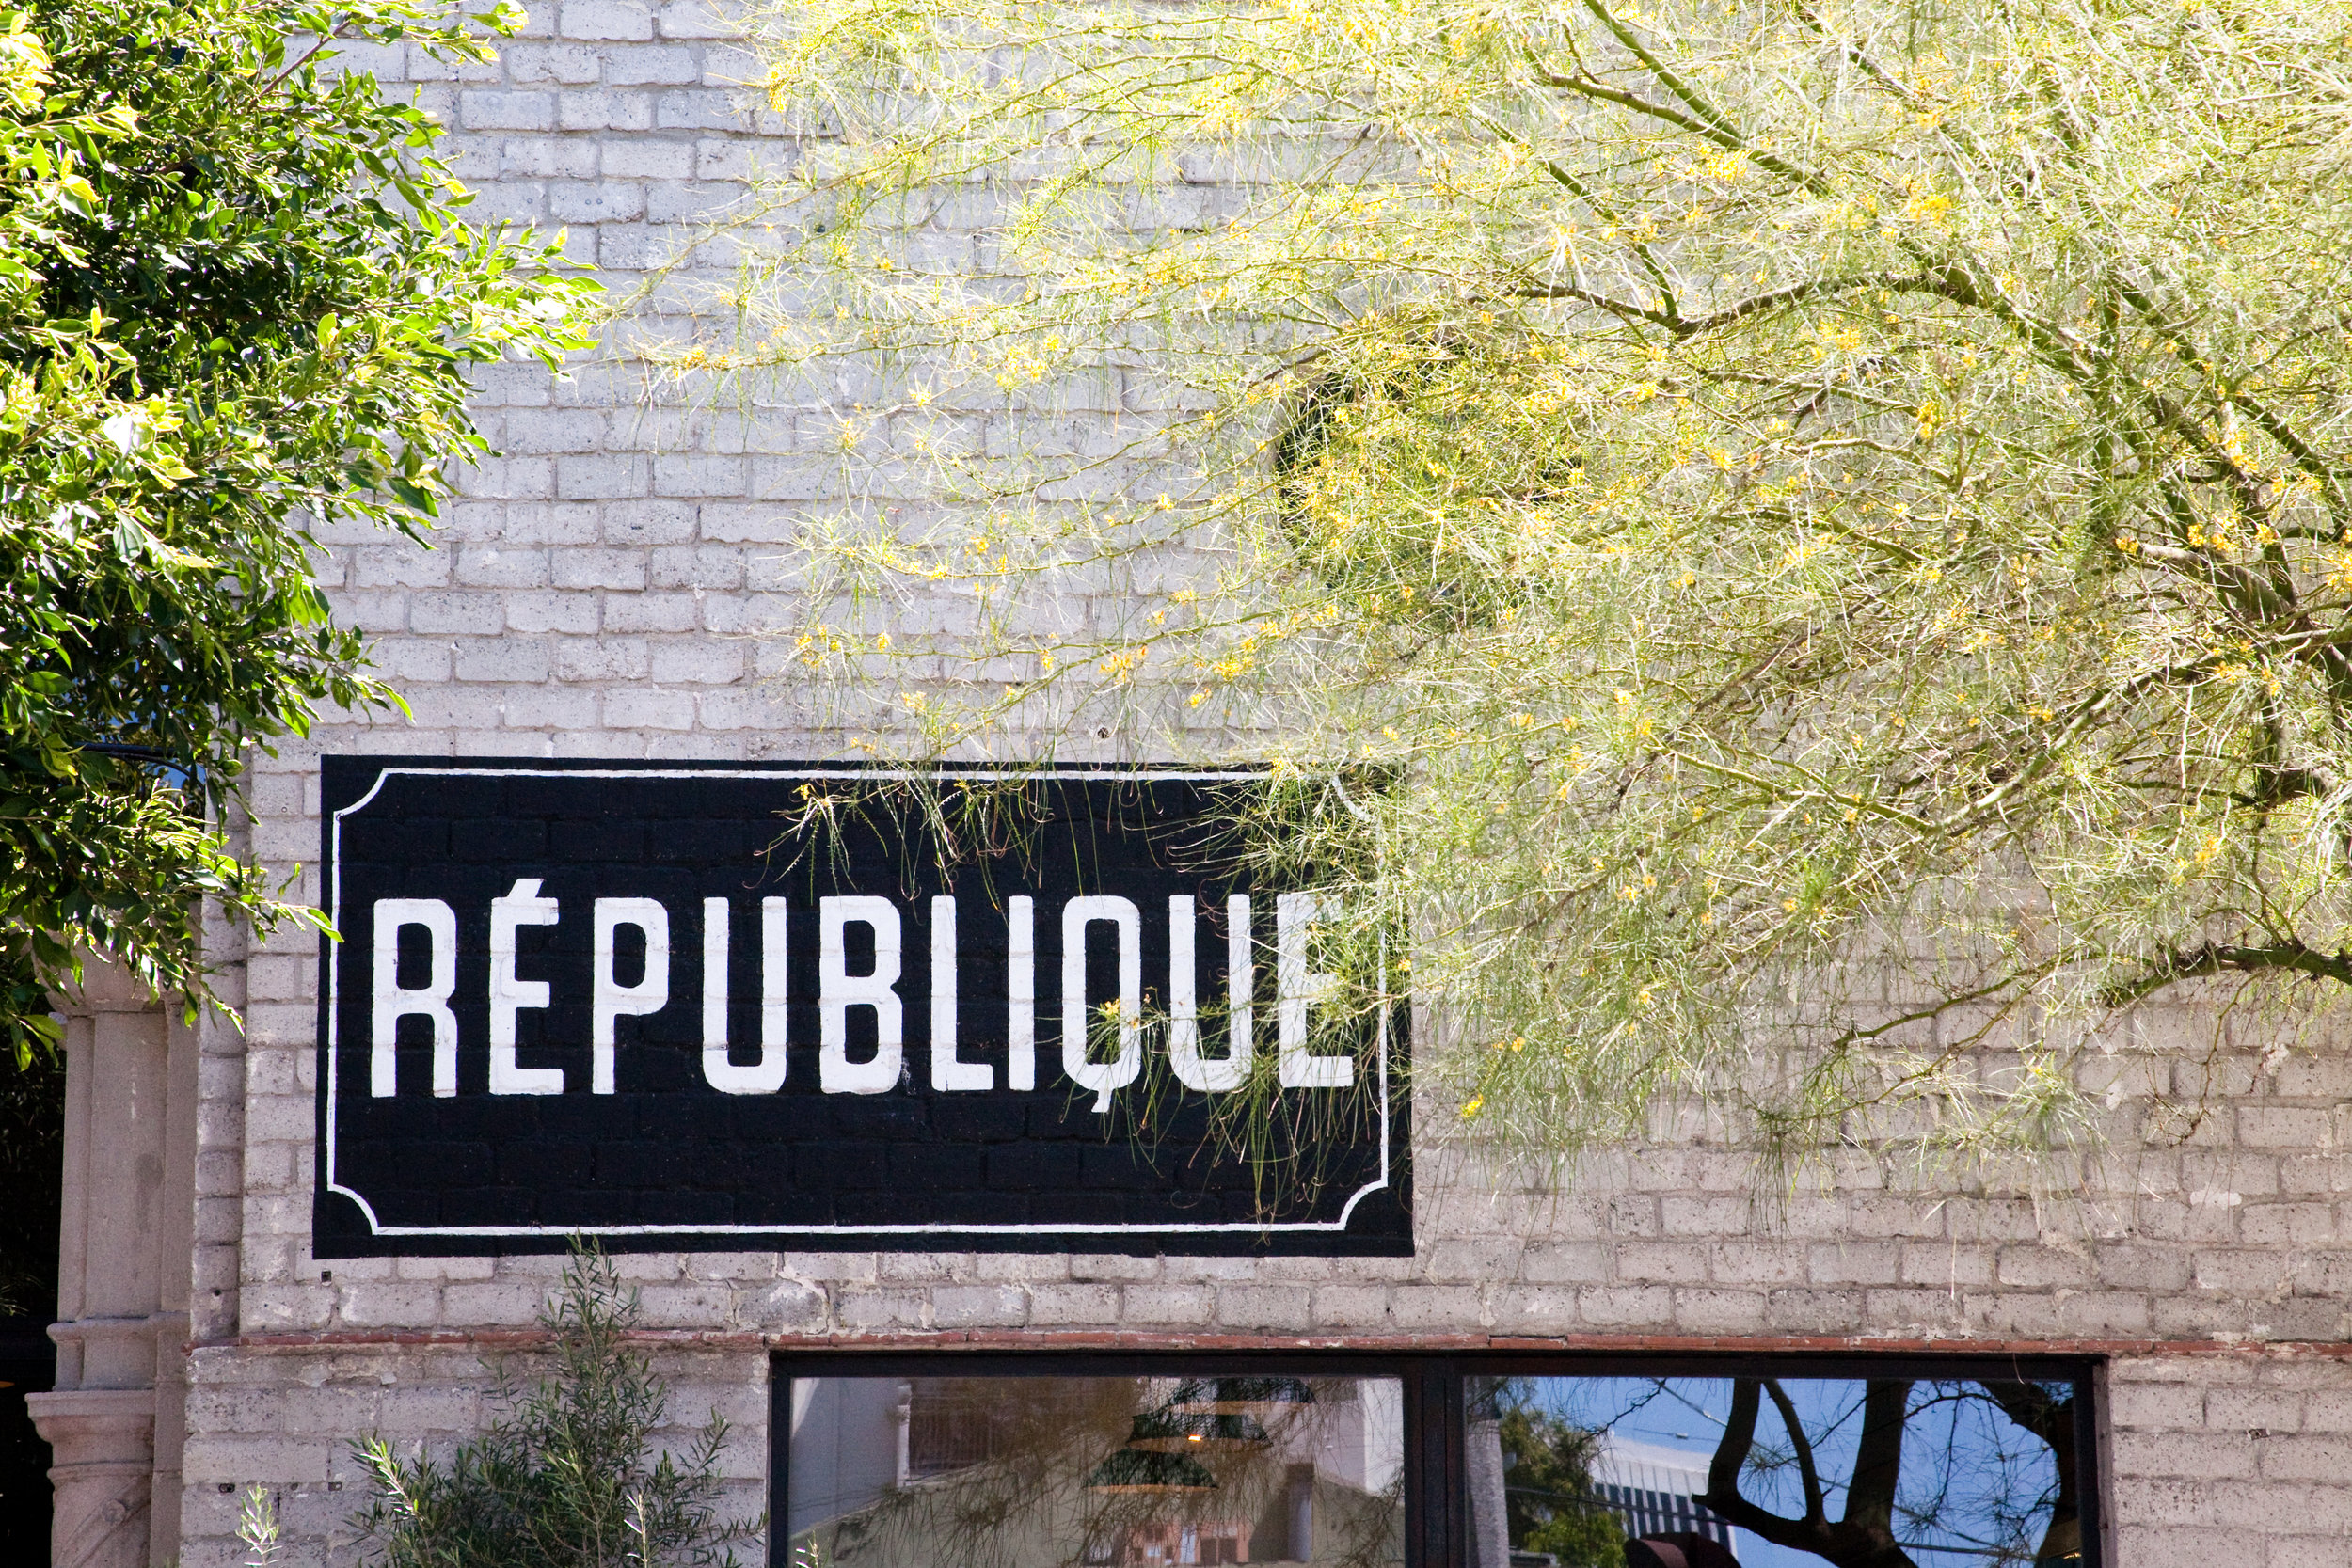 Republique / Los Angeles, CA / img cred: AJ Quon